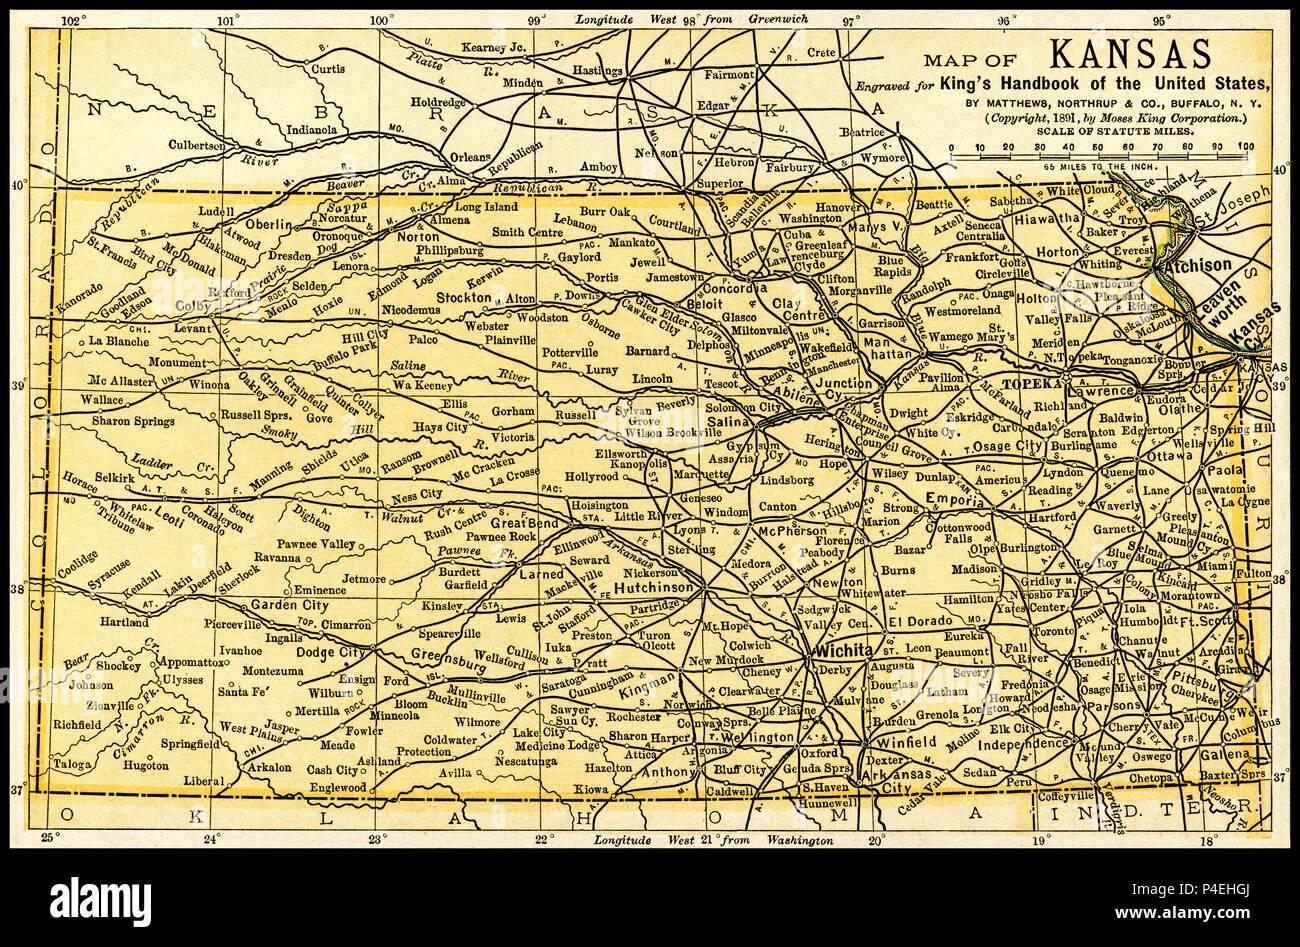 Kansas Antique Map 1891: Map of Kansas from an 1891 guidebook ...